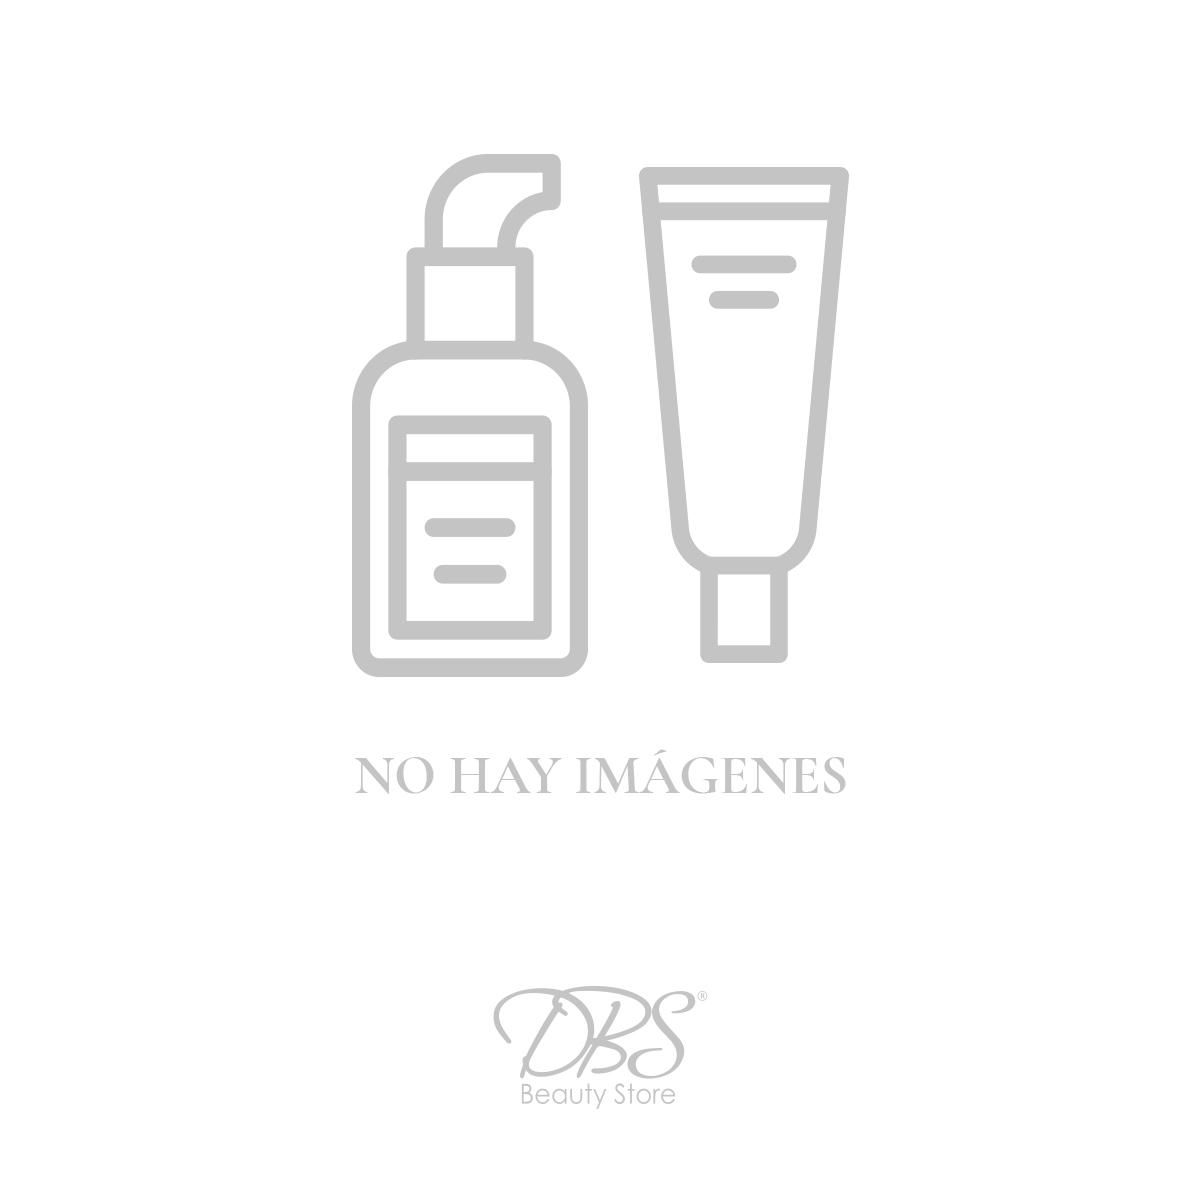 loreal-maquillaje-LO-48000.jpg